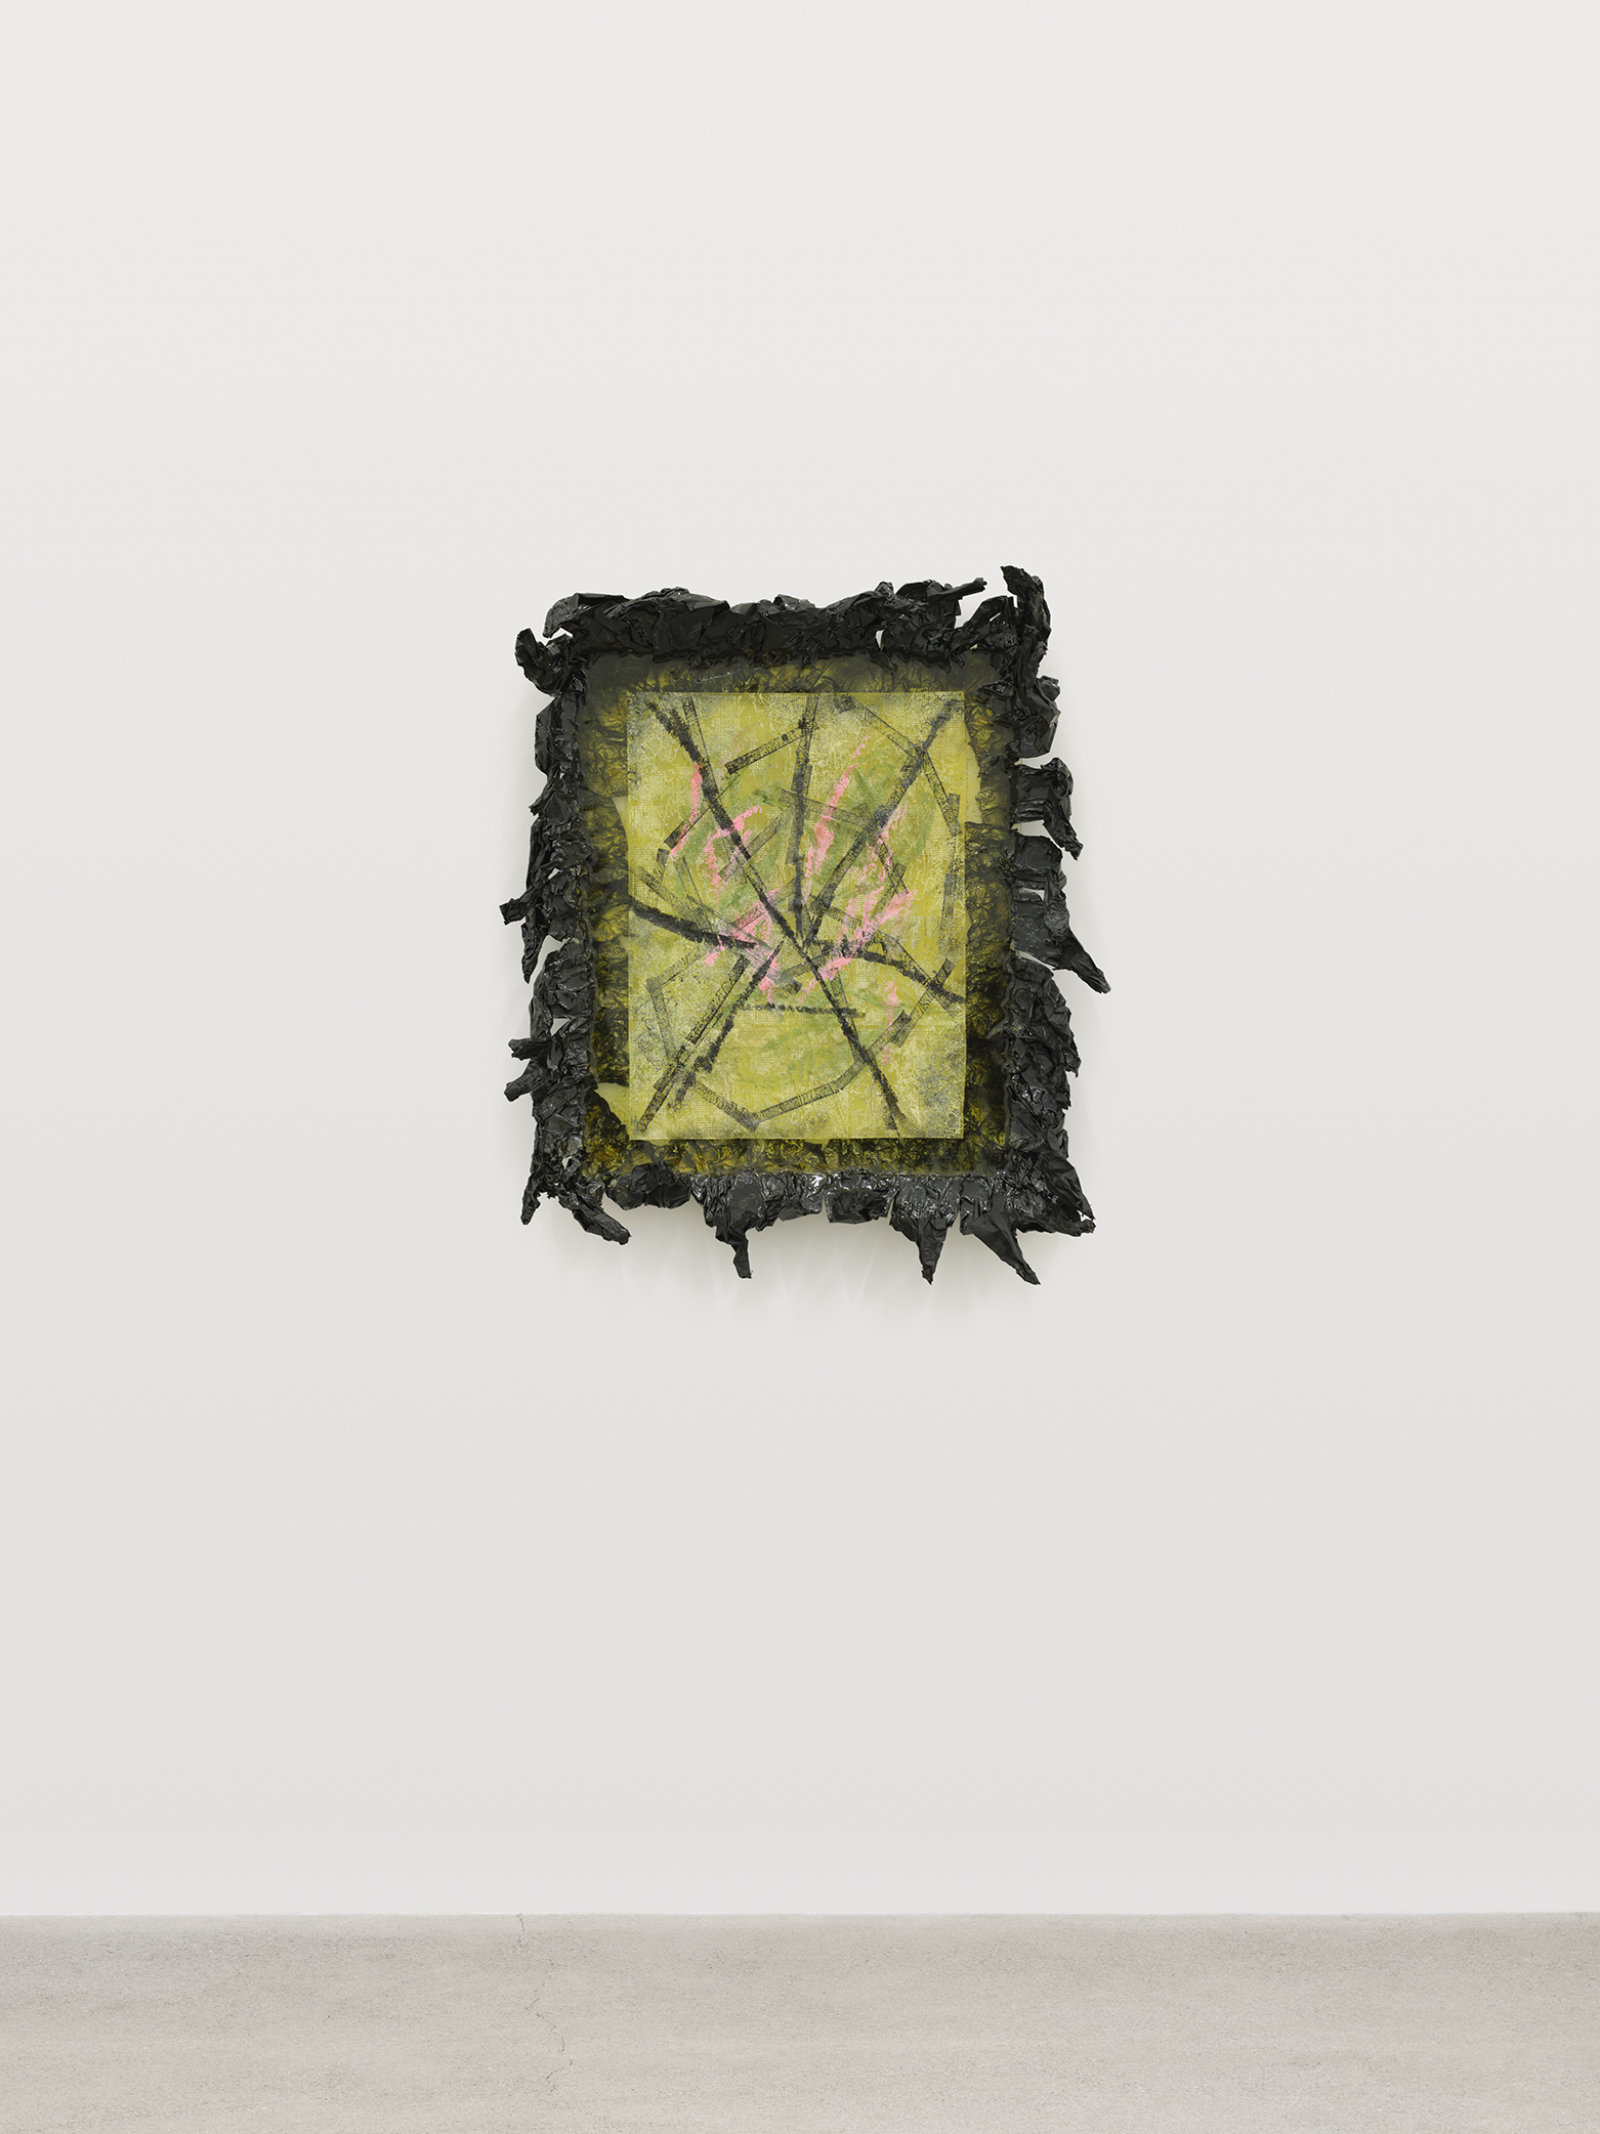 Rebecca Brewer, Live Resin: Spoiled, 2020, polyester resin, cinefoil, plexiglas, embossing powder on vellum, 37 x 31 x 7 in. (94 x 79 x 18 cm)